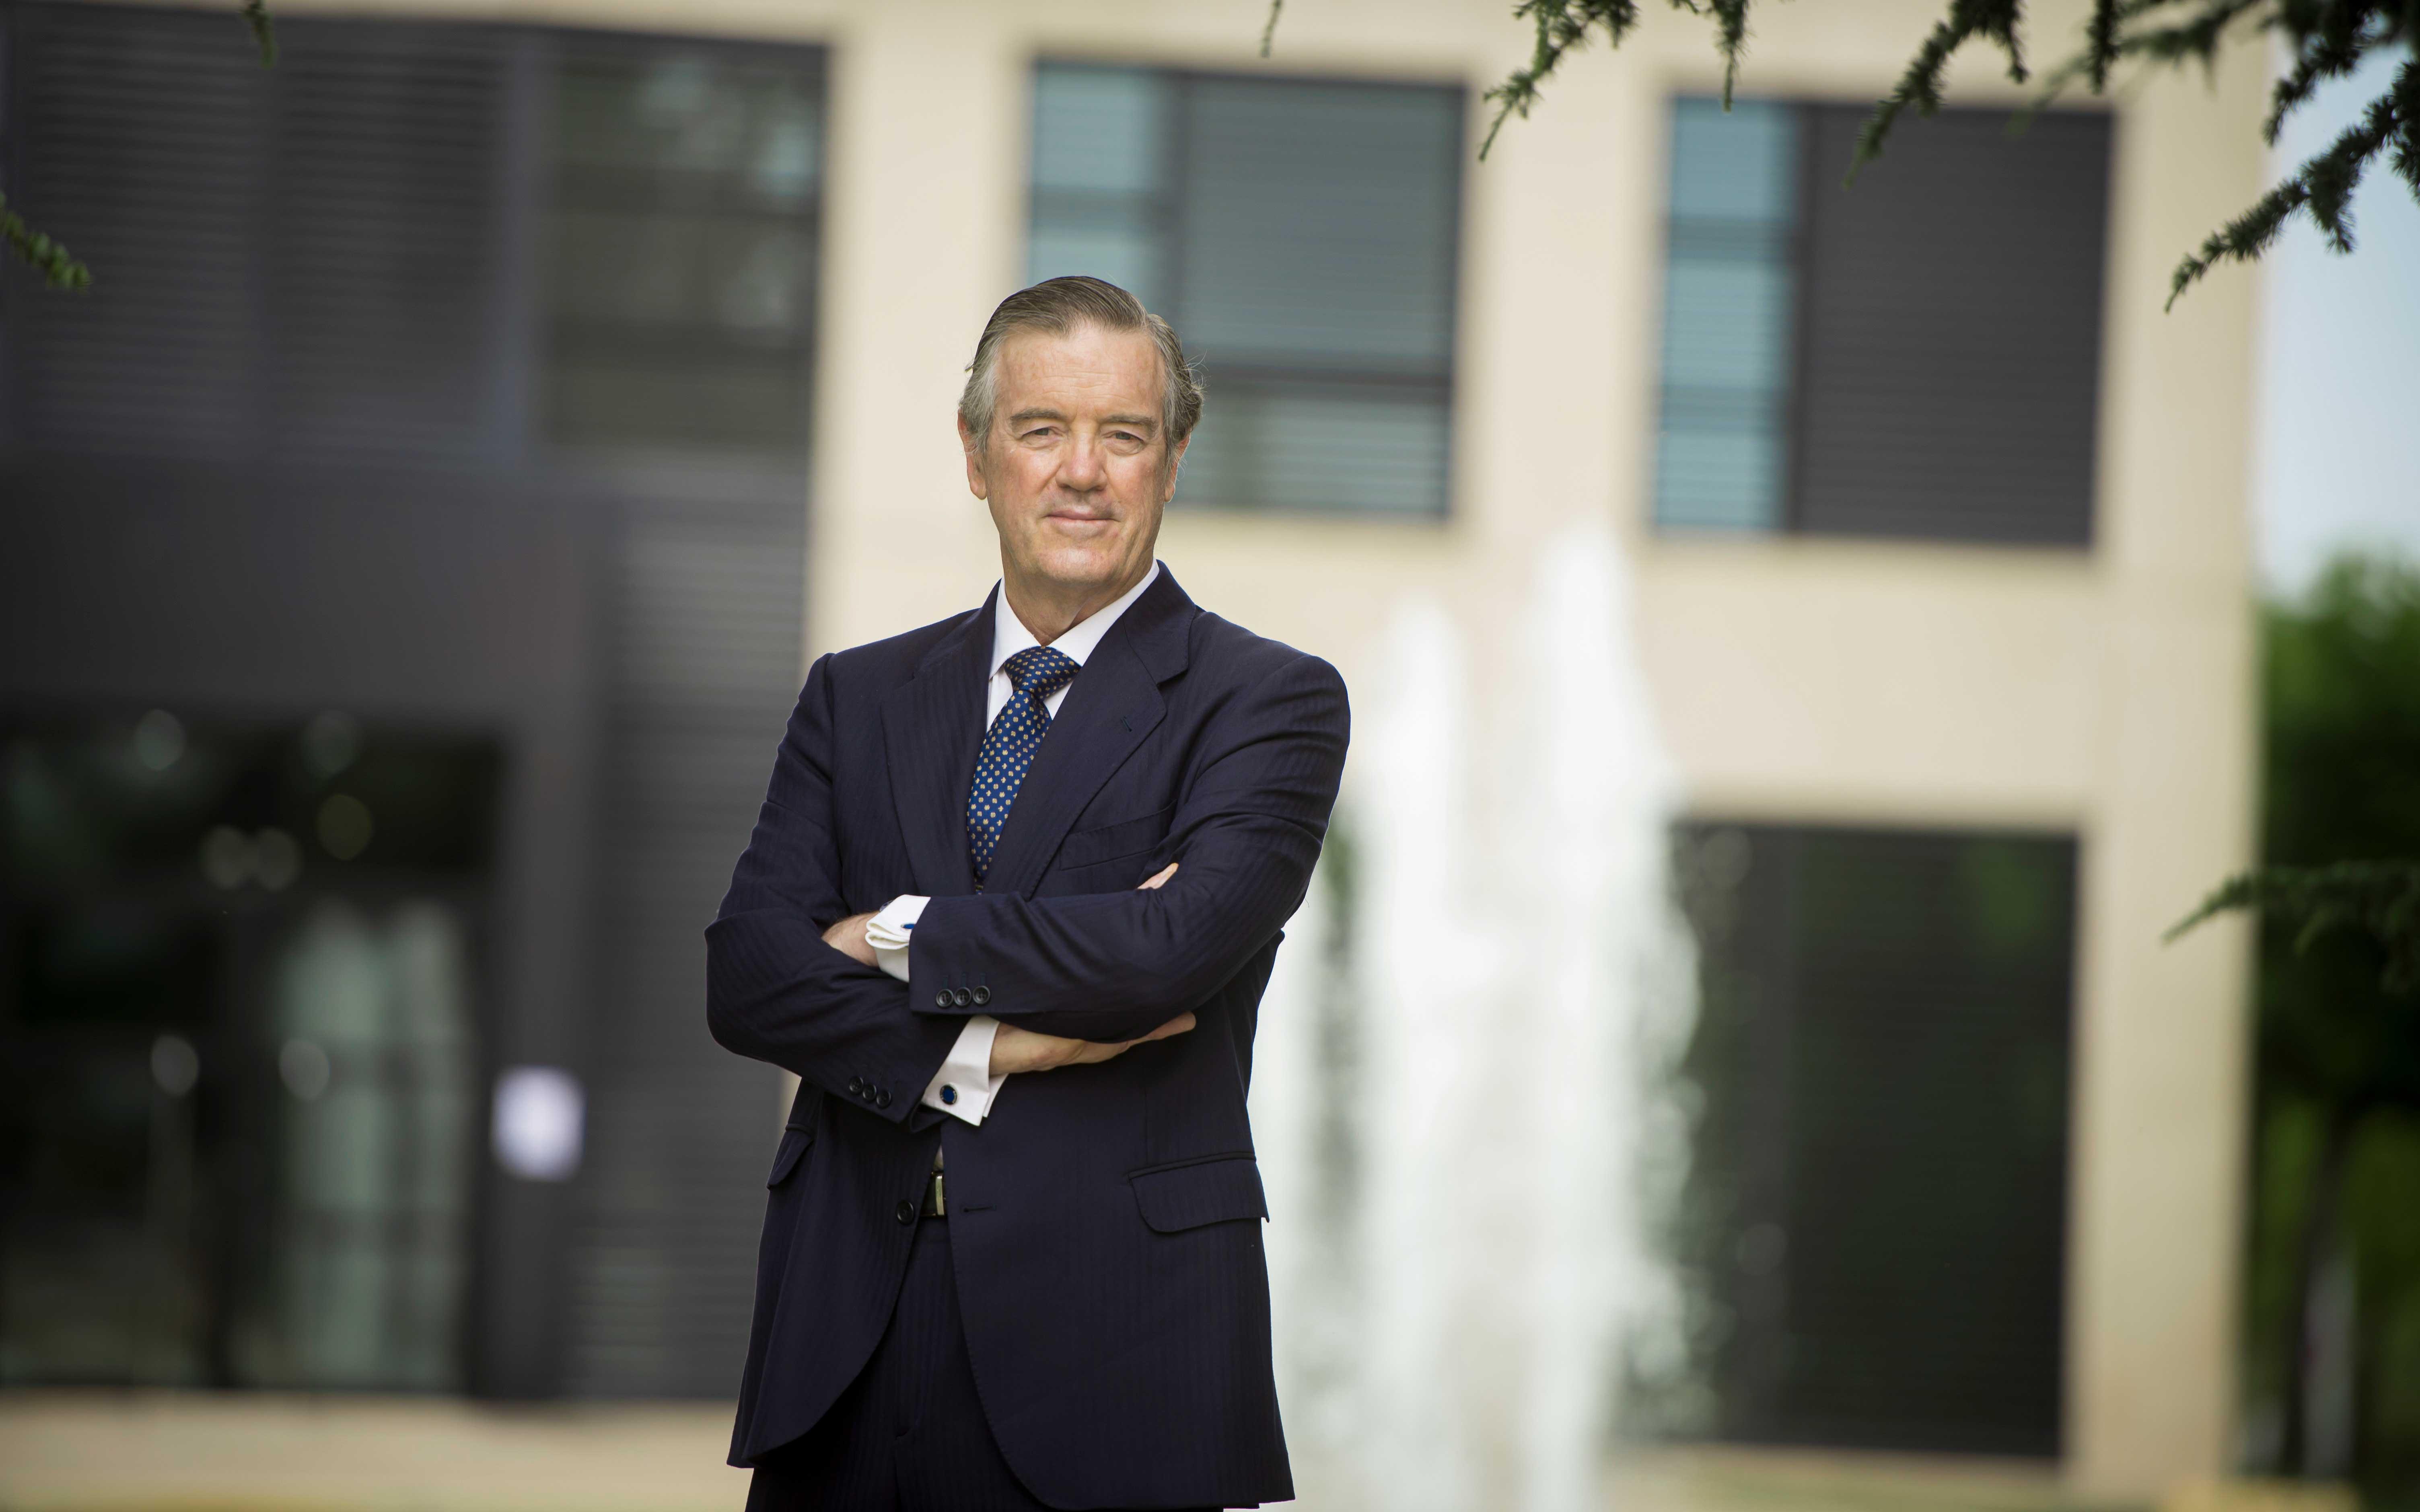 Andrés Sendagorta, new President of the SENER Group